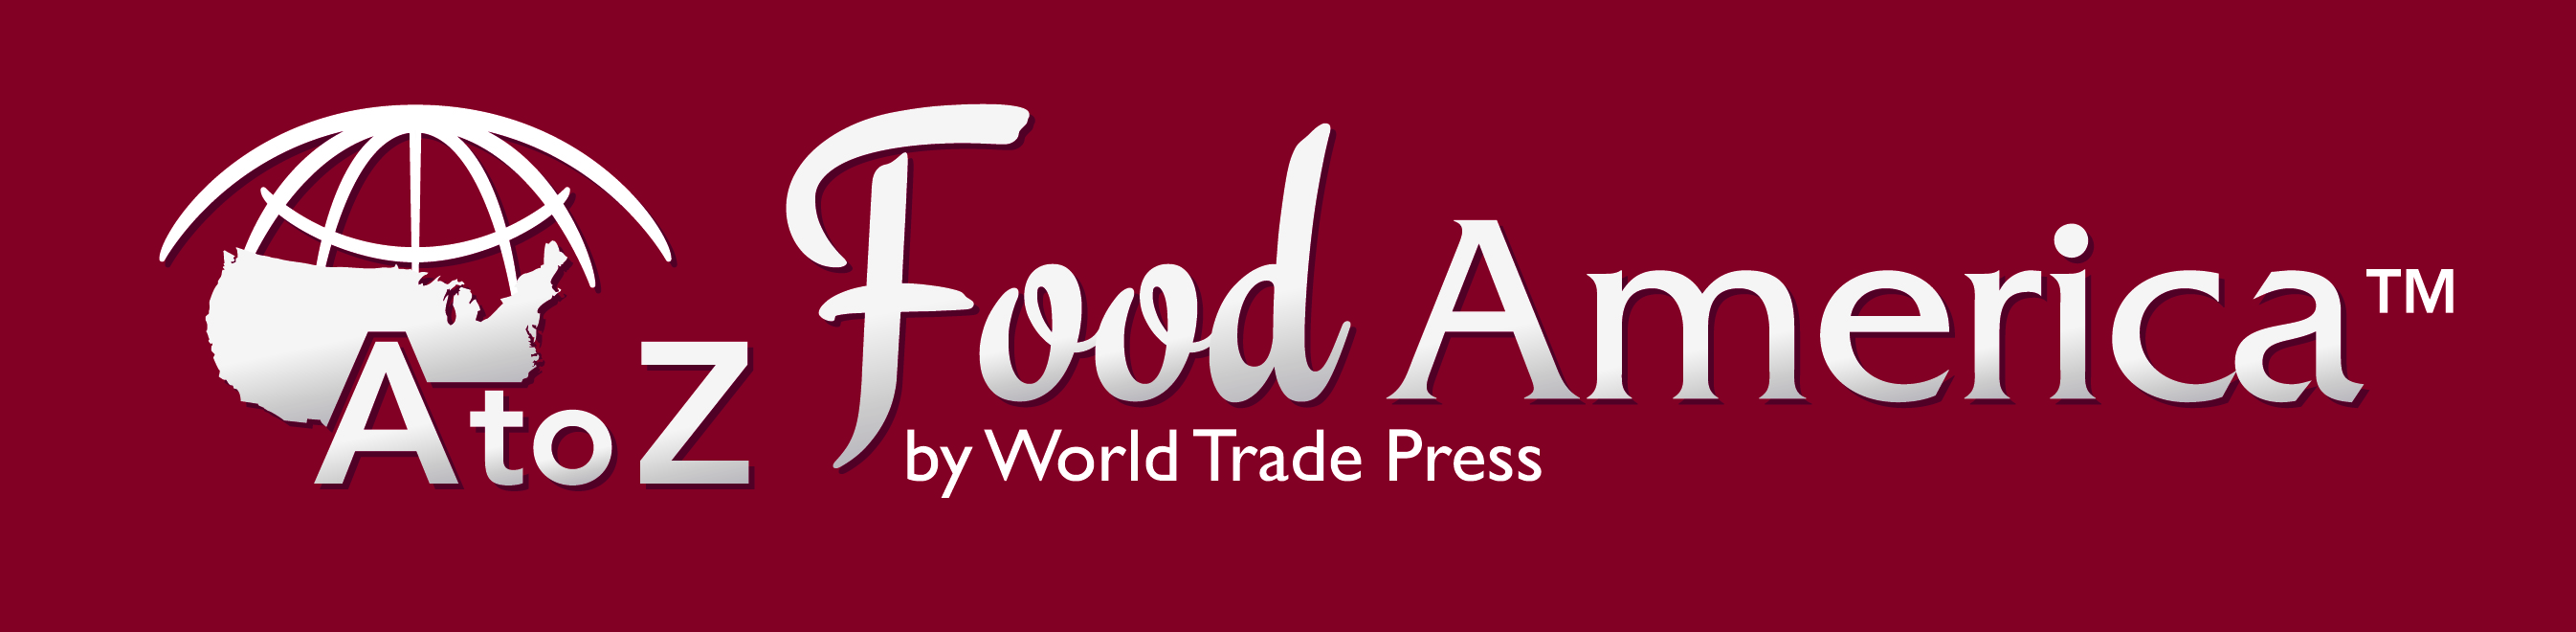 AtoZ Food America JPG